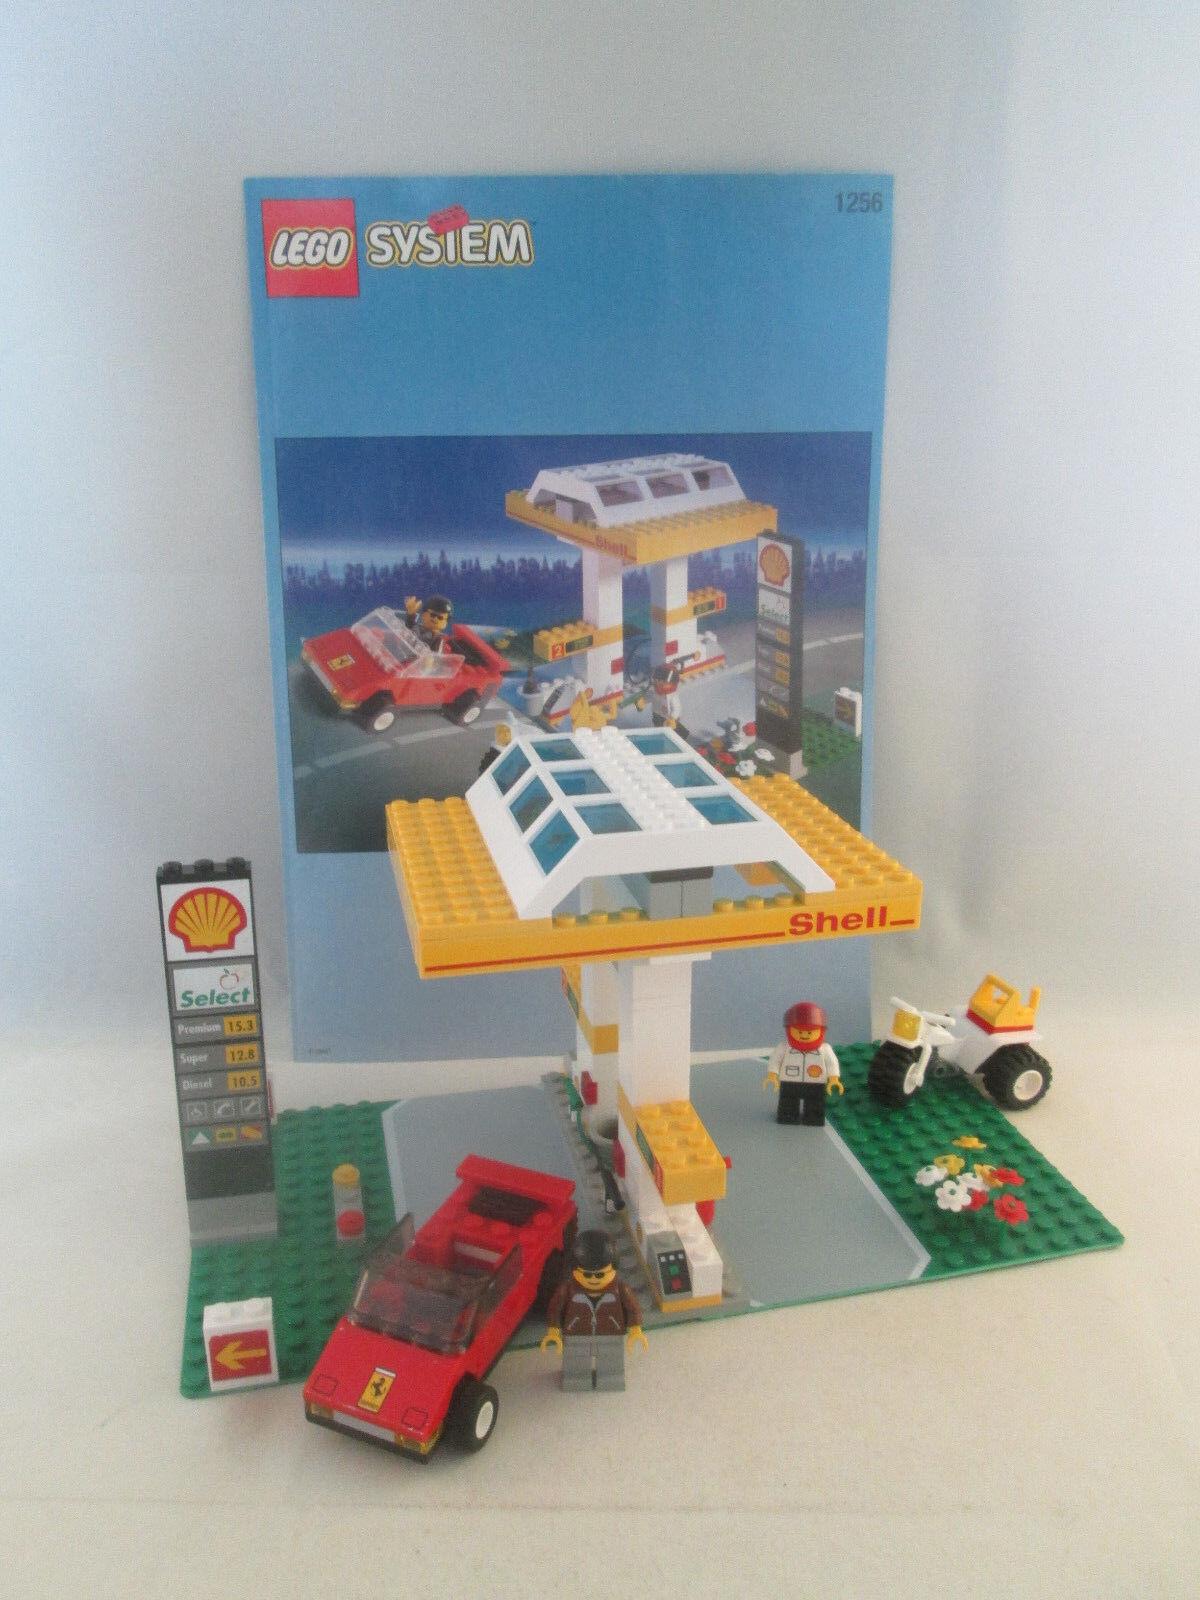 Lego Town Jr - 1256 Shell Petrol Pump